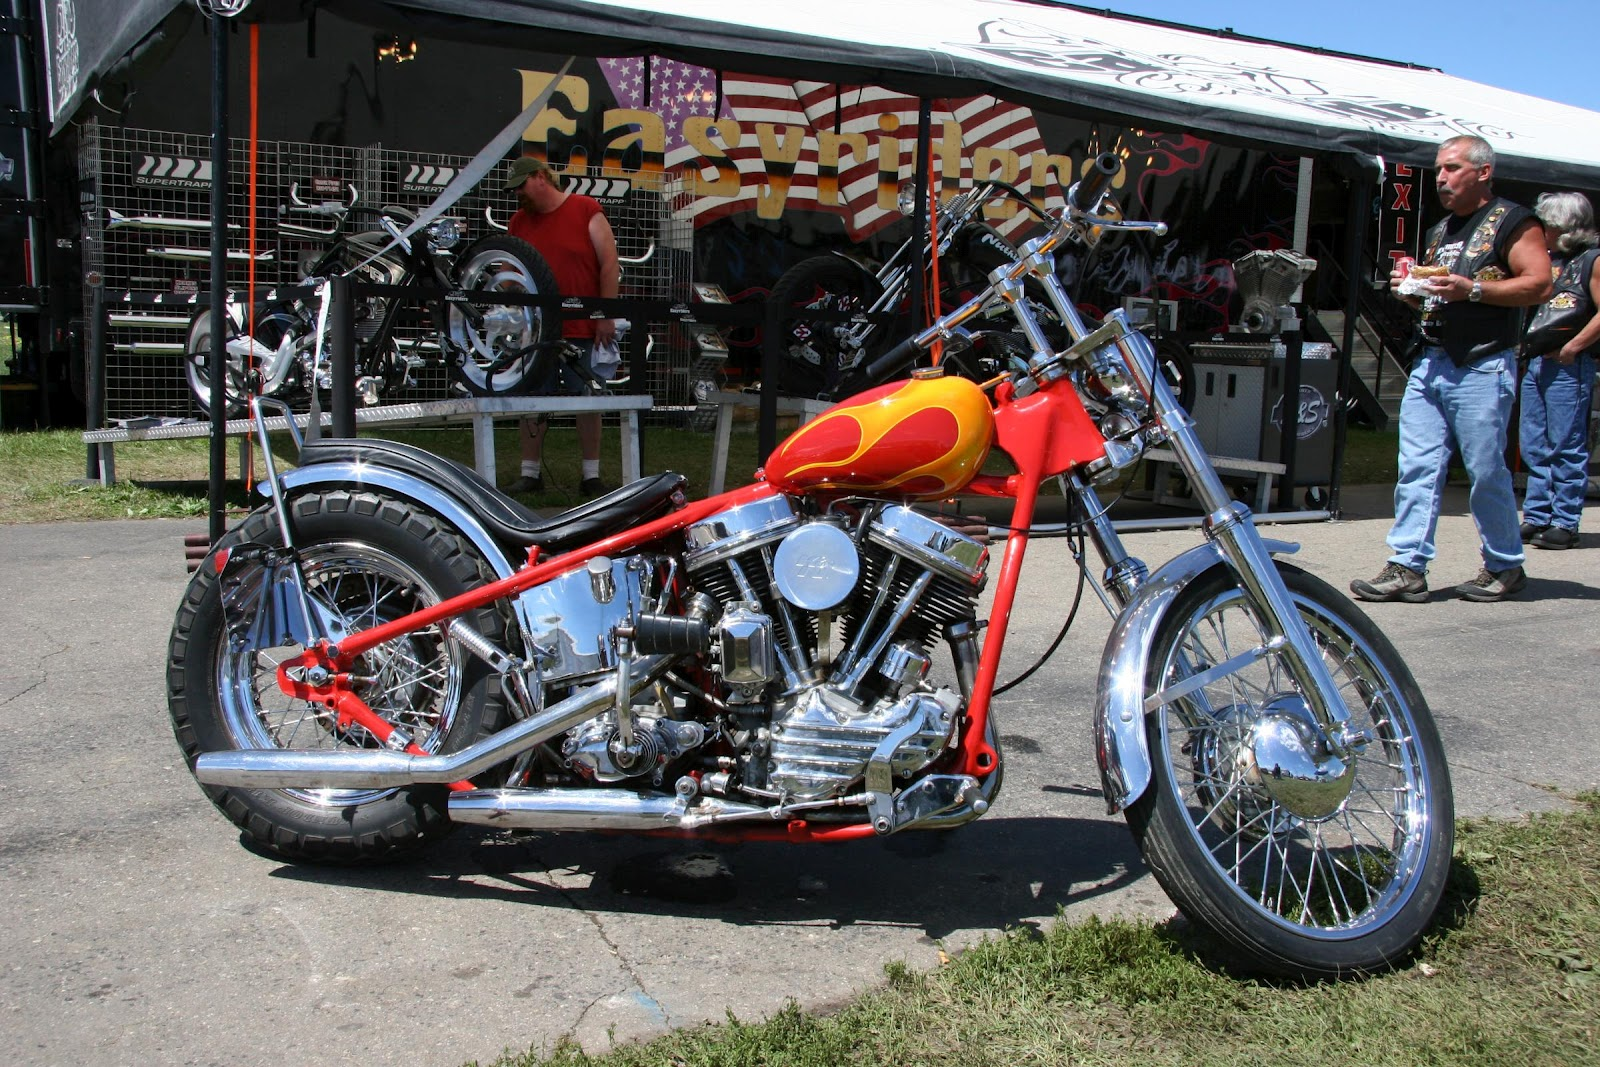 http://3.bp.blogspot.com/-Mz_N38f7ZtU/UERSsVBA2gI/AAAAAAAABN4/6Bc3RcIljyA/s1600/Custom_Built_Motorcycles_Harley_Davidson_wallpaper.jpg